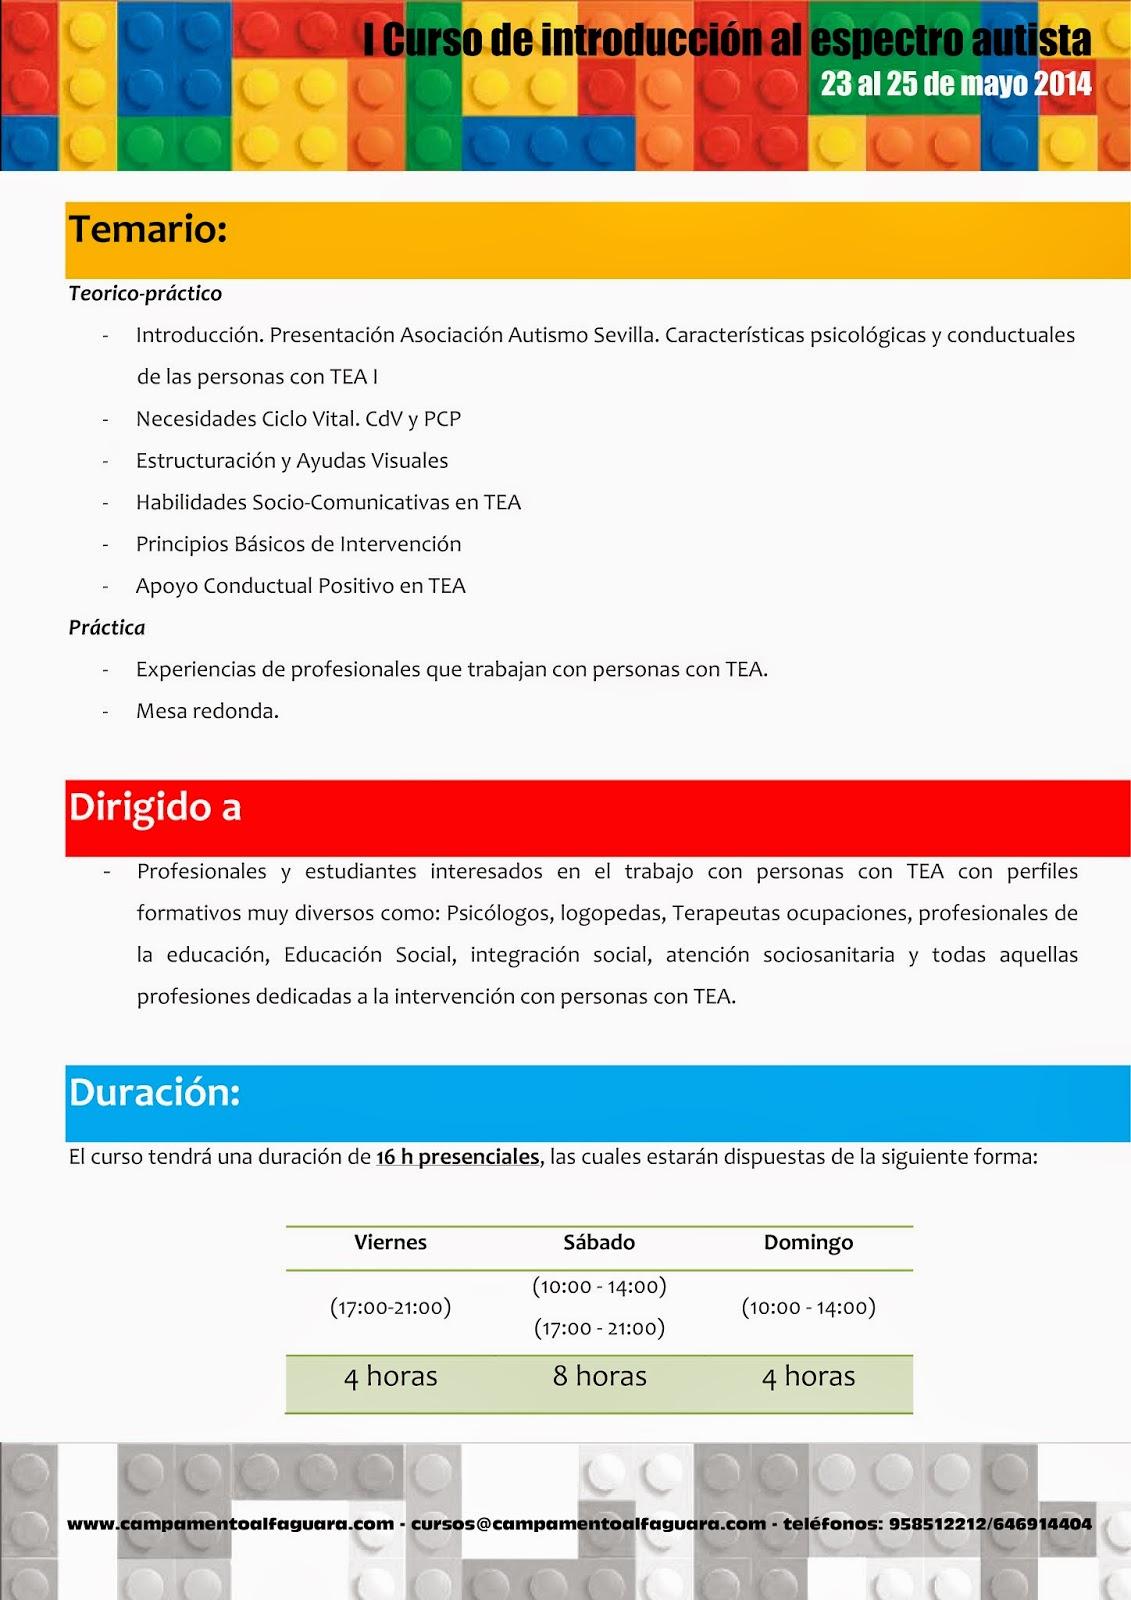 http://www.campamentoalfaguara.com/ficha_tecnica.pdf